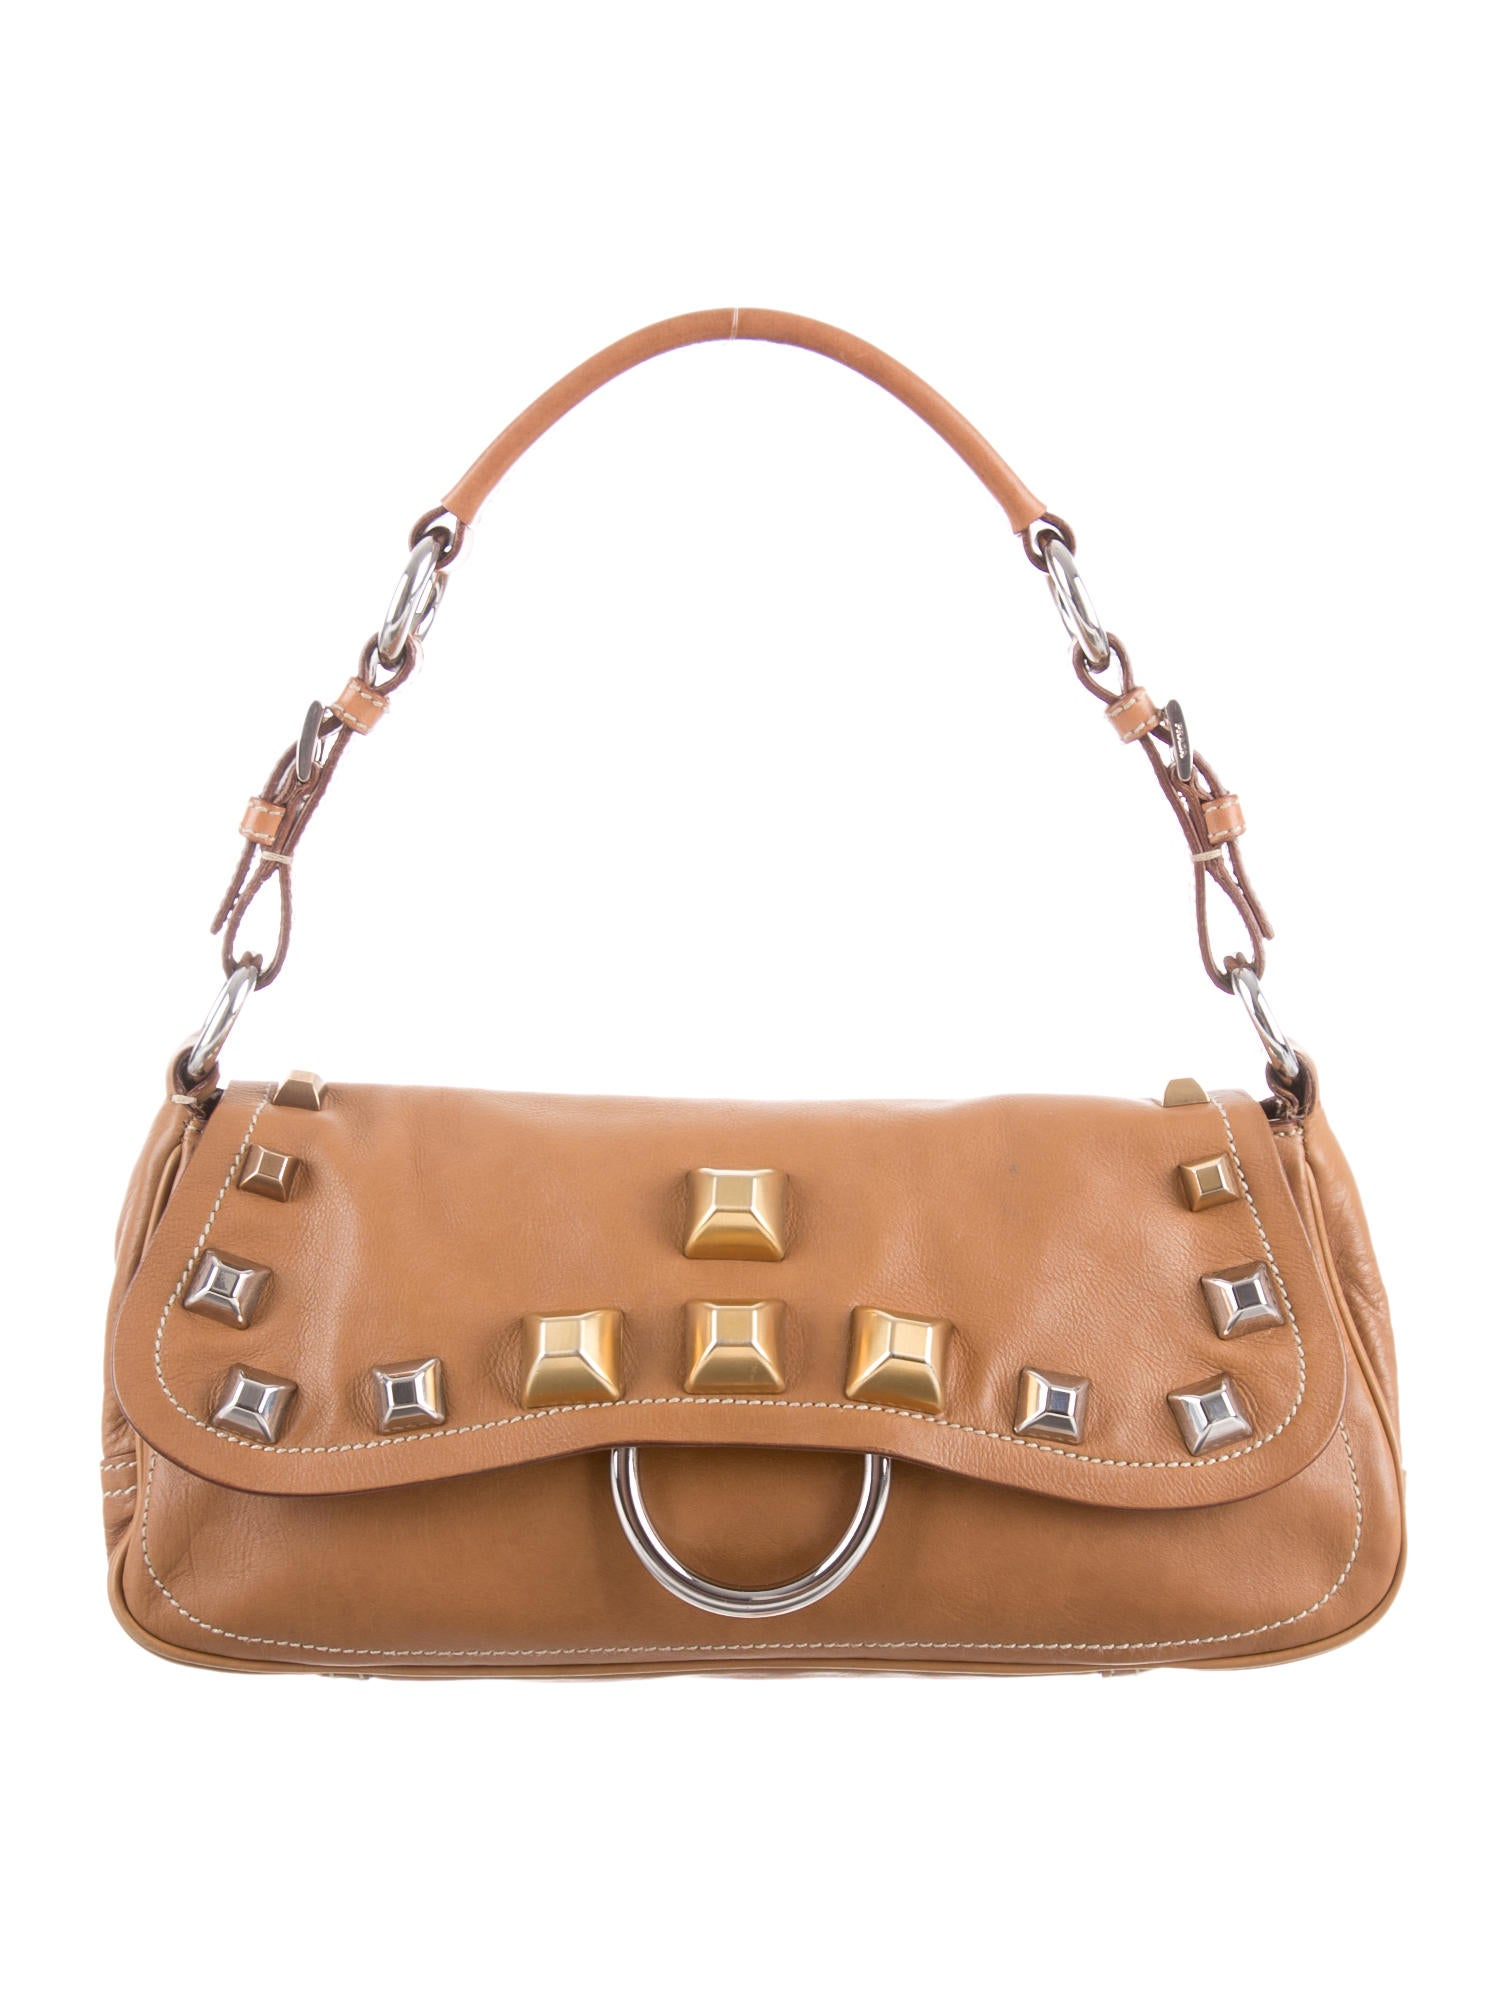 Prada Nappa Shoulder Bag - Handbags - PRA57485   The RealReal